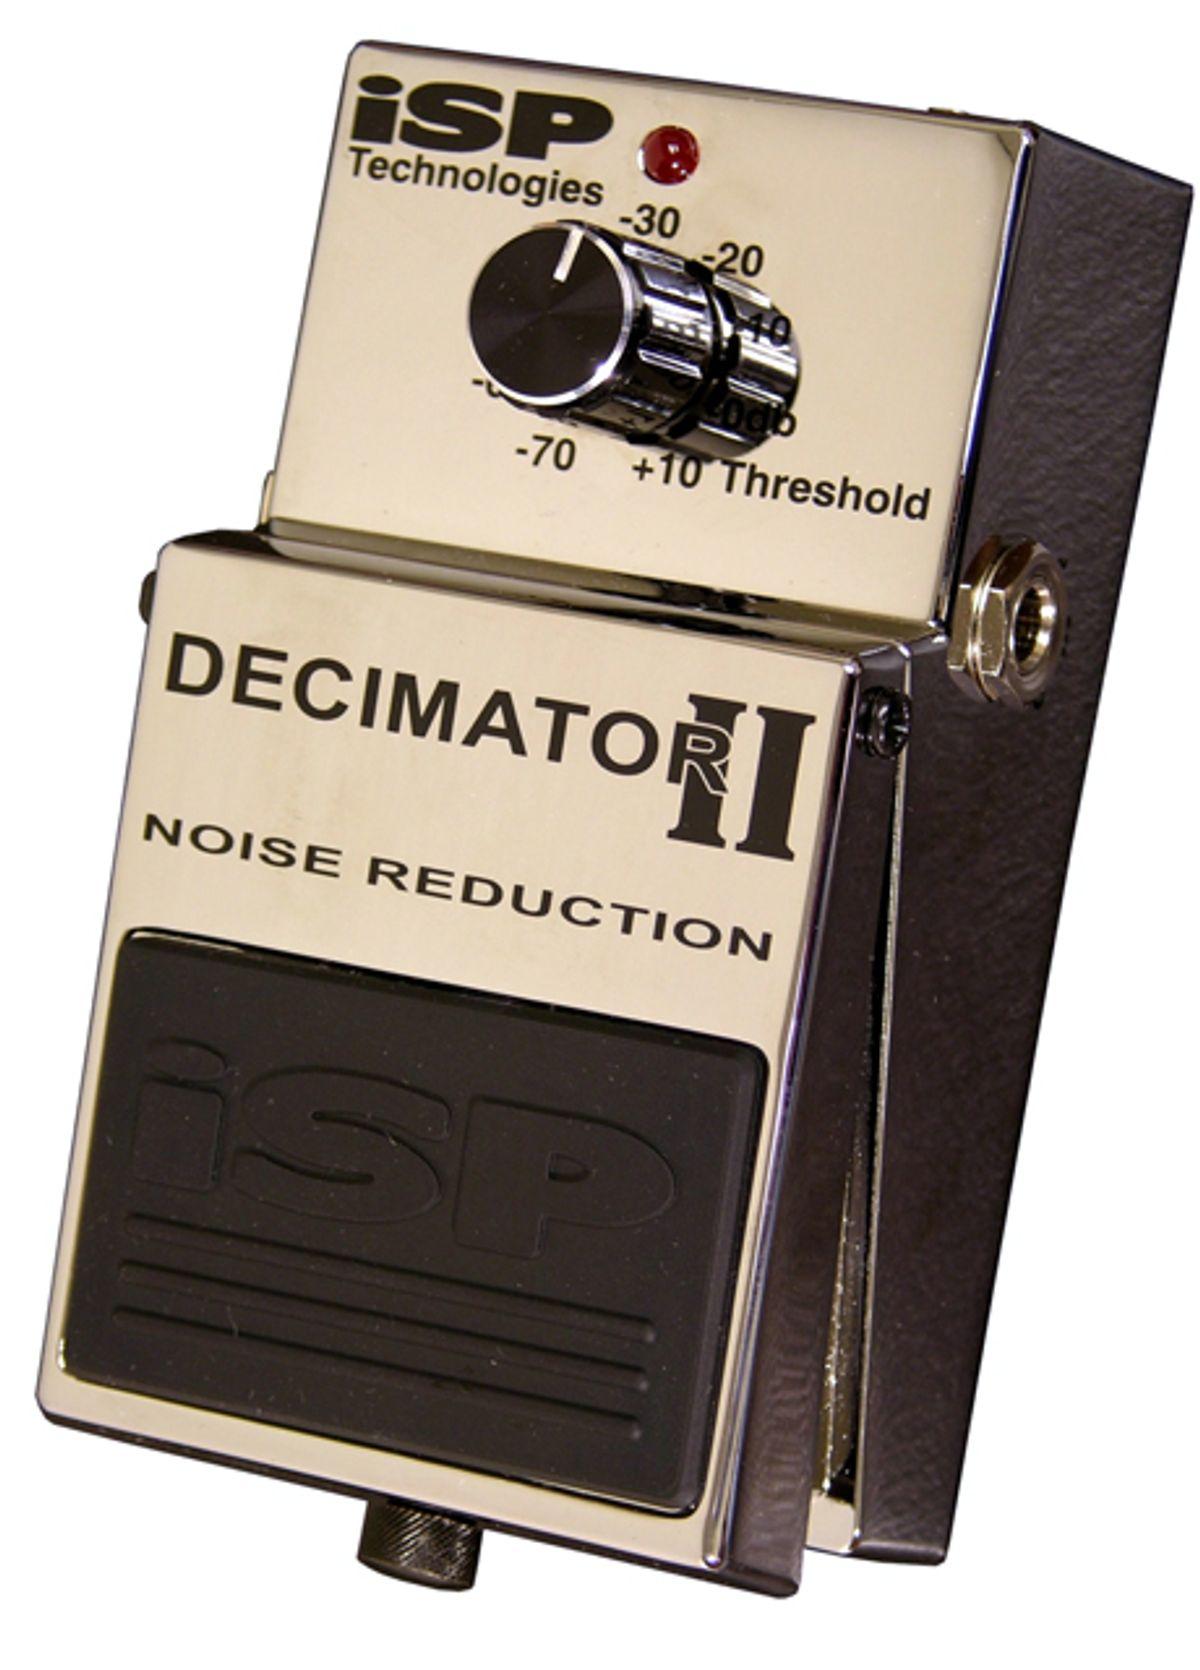 ISP Technologies Releases the Decimator II and Decimator G String II